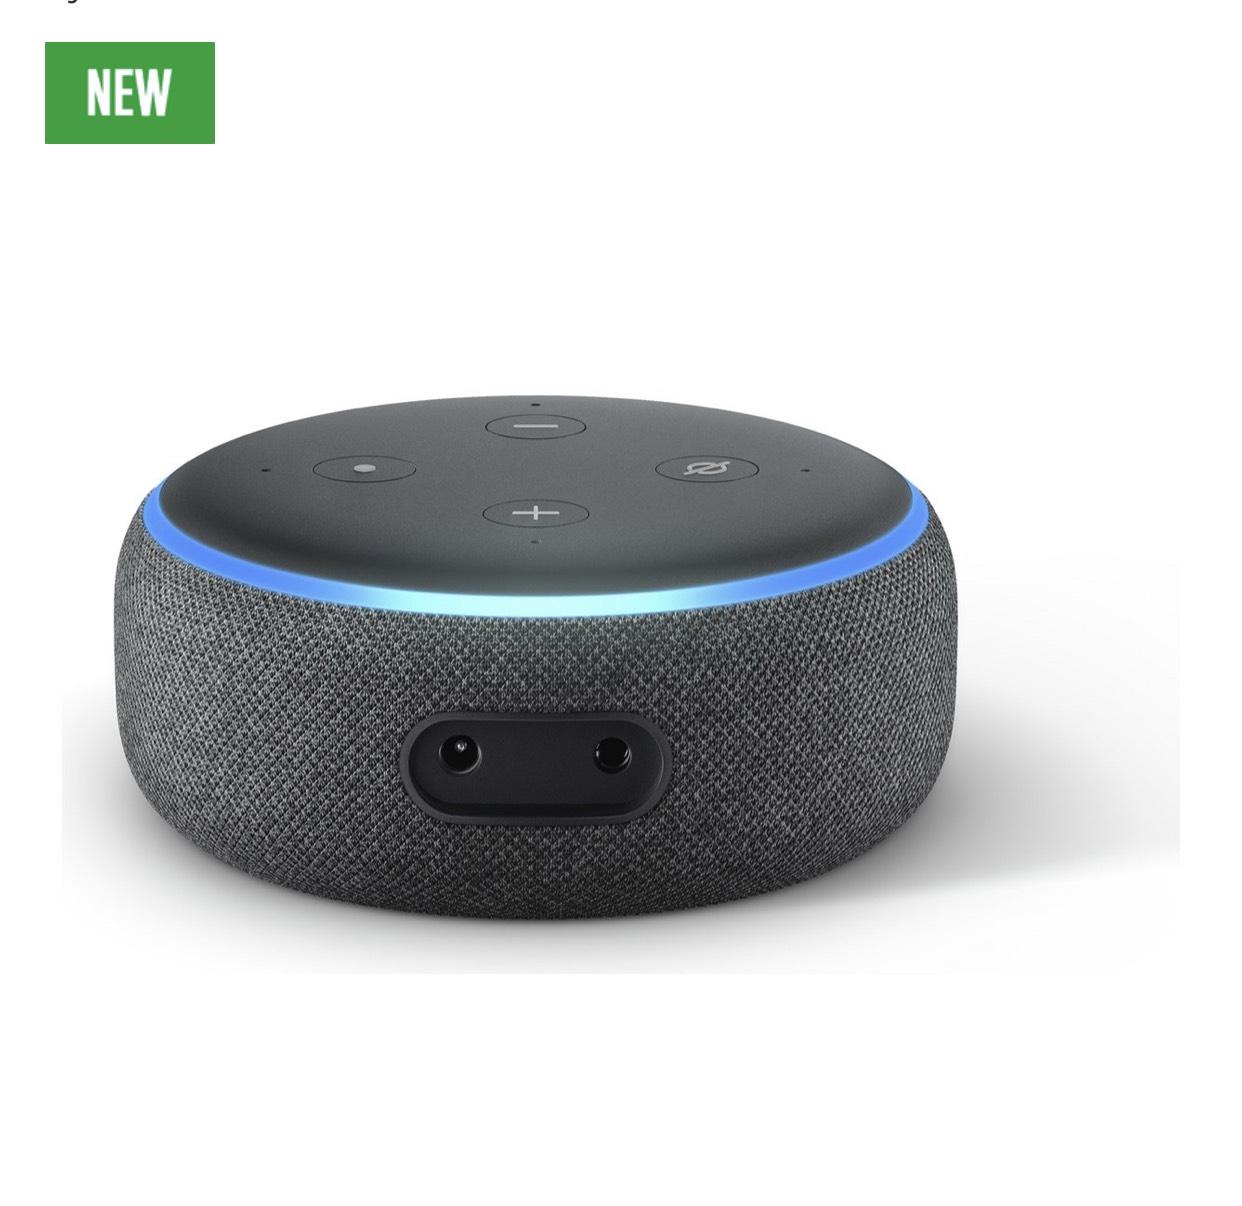 New Amazon Echo Dot - Black - £24.99 @ Argos (free C&C)